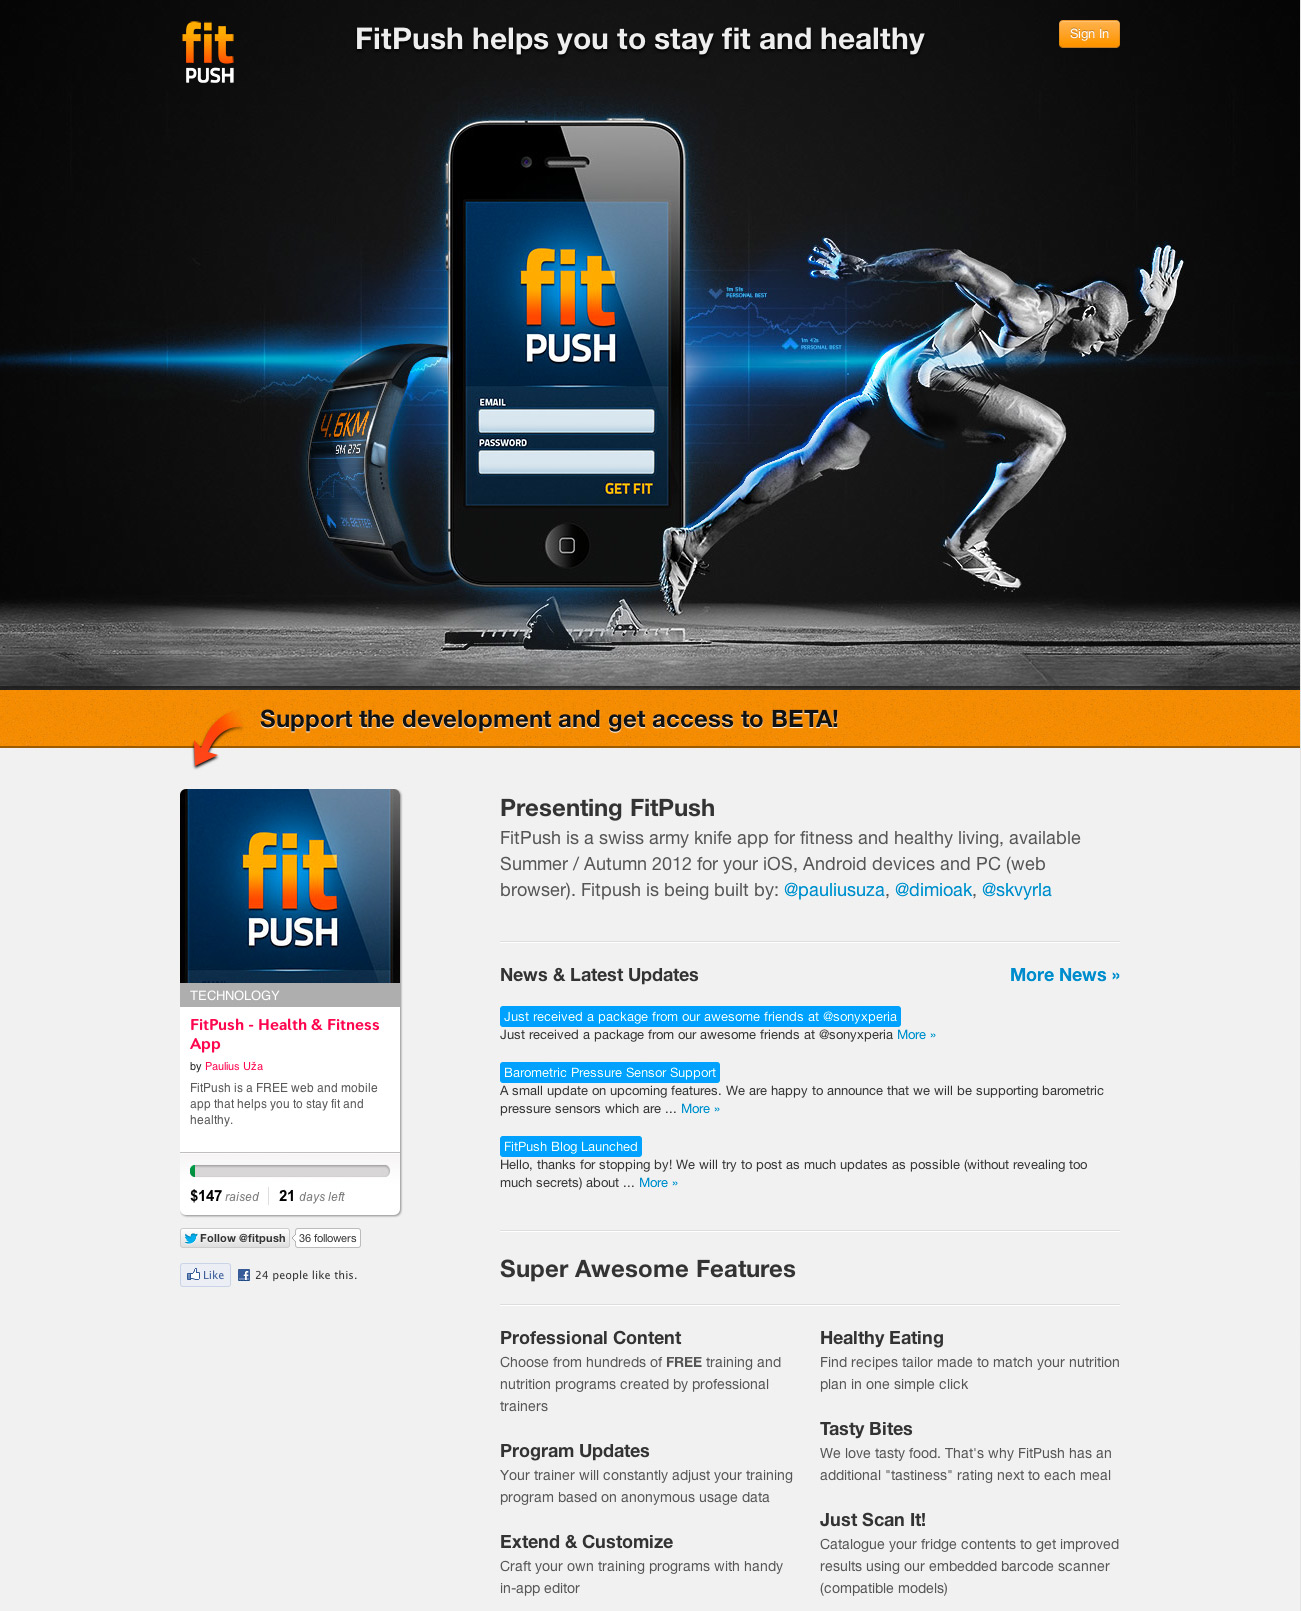 FitPush Website Screenshot